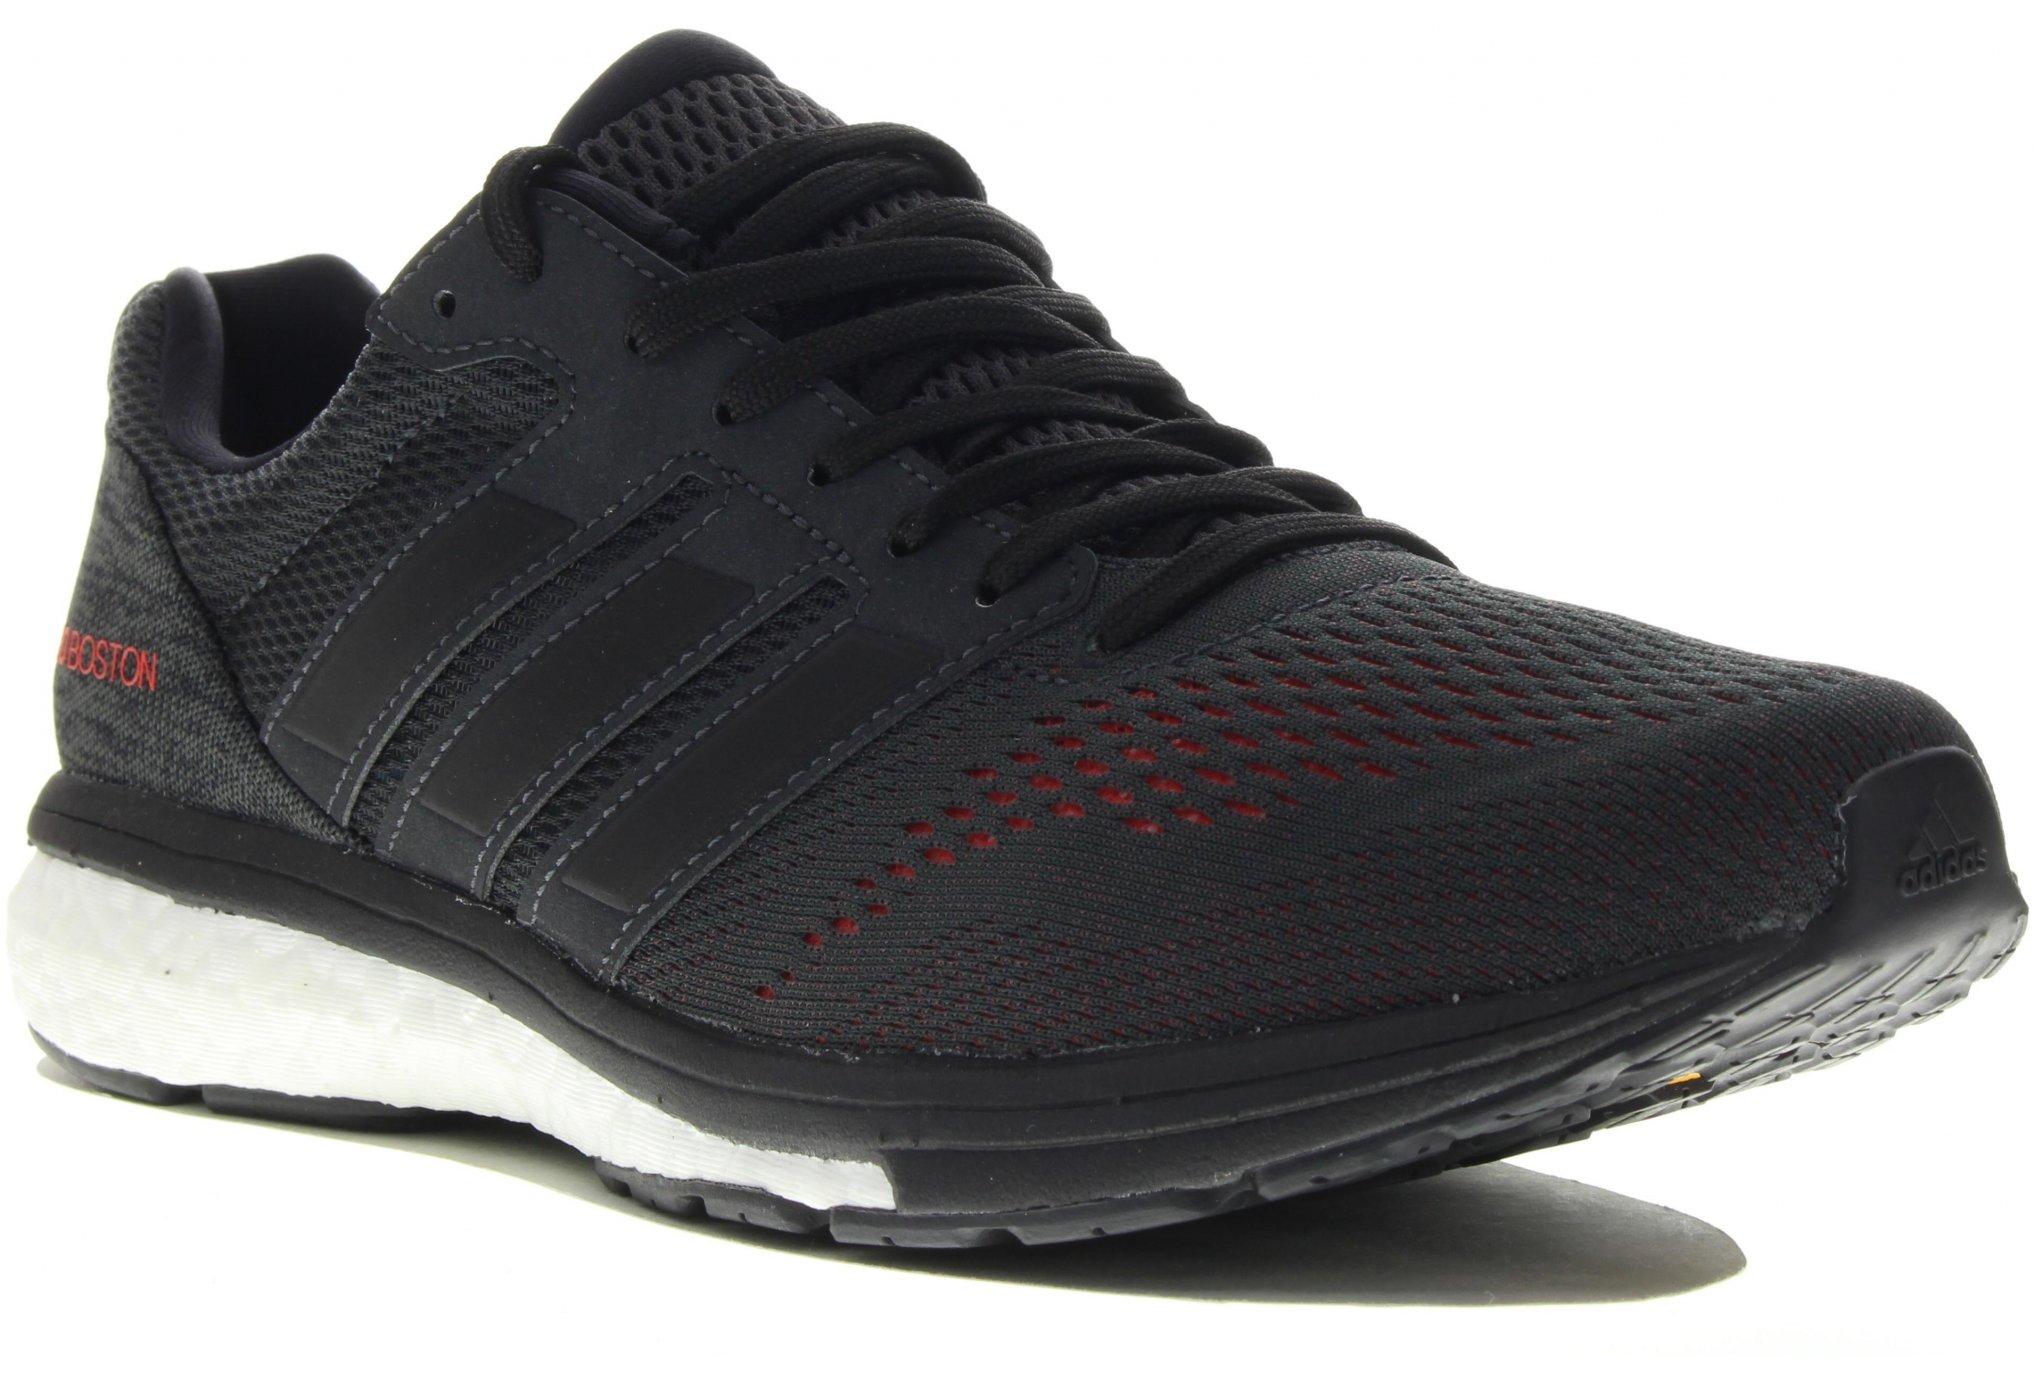 Adidas Adizero boston 7 m chaussures homme